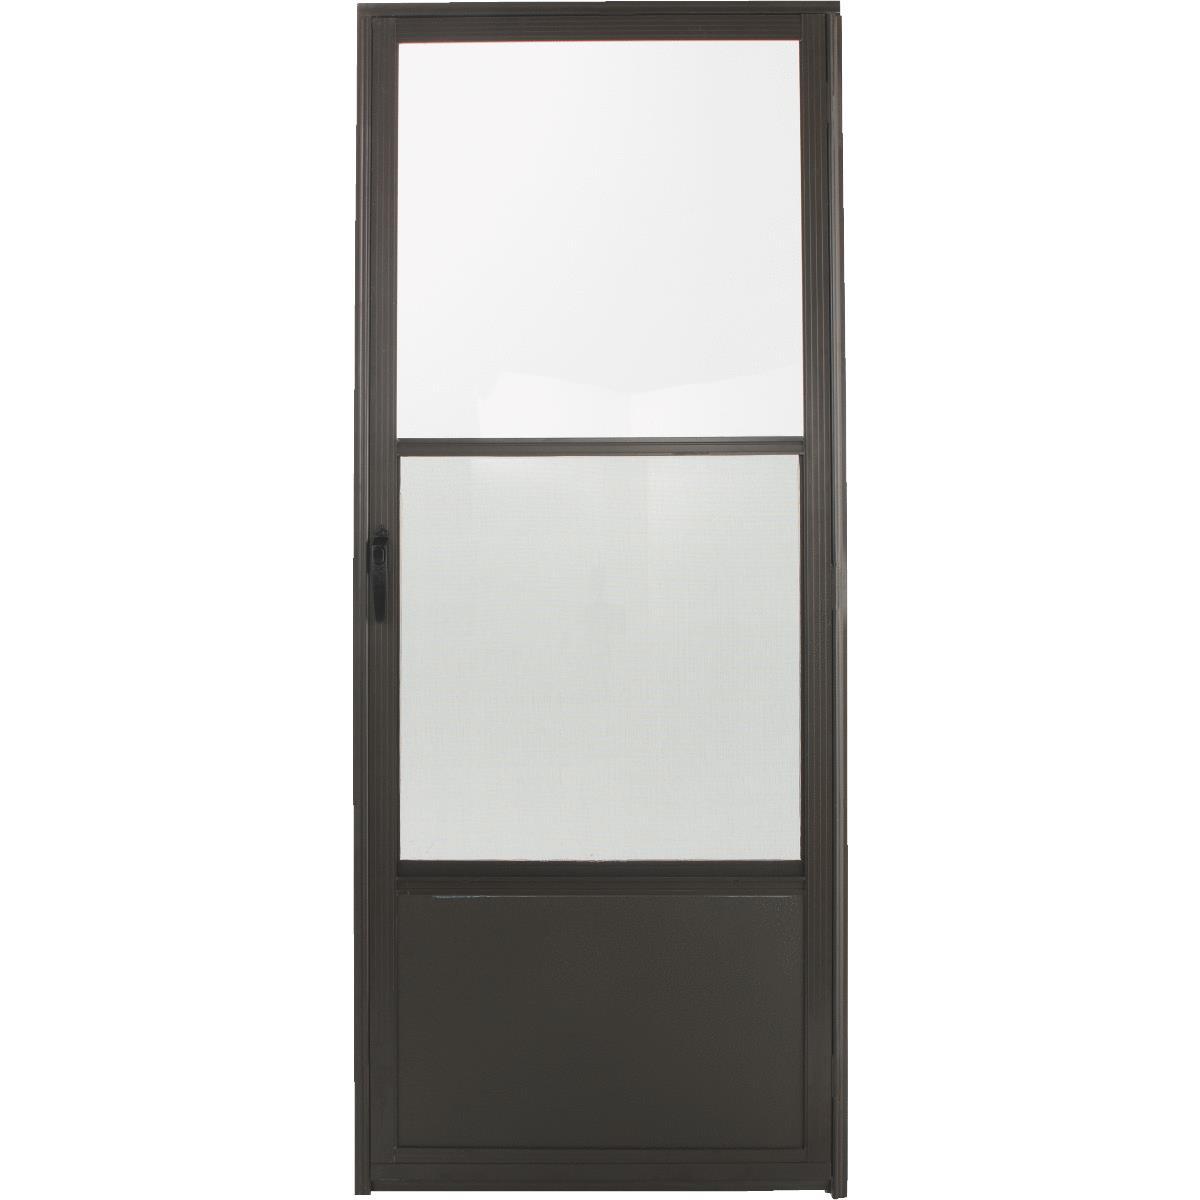 CROFT Continental Style 563 Aluminum Storm Door